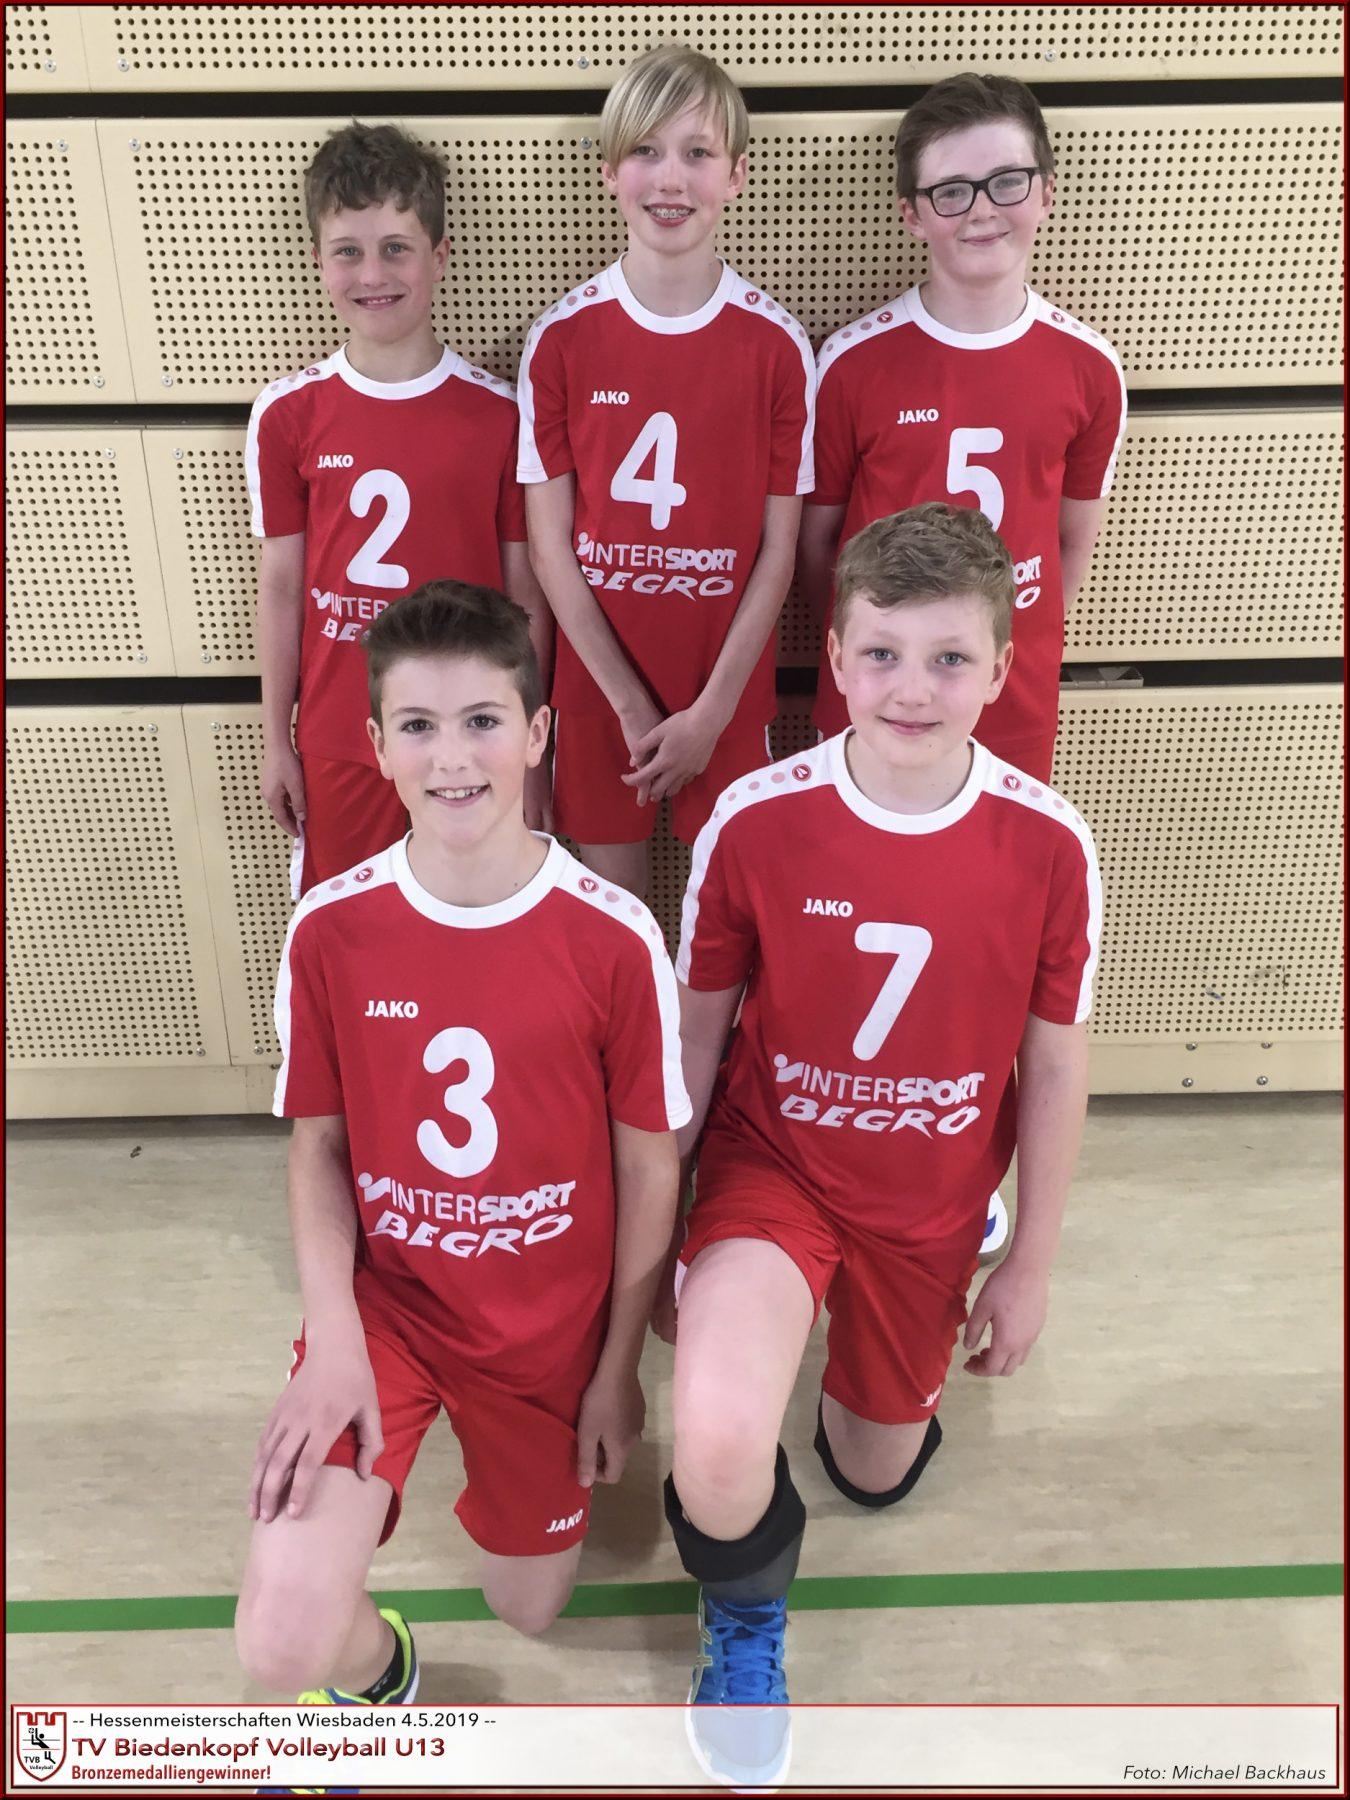 Volleyball U13m TV Biedenkopf Hessenmeisterschaften Wiesbaden Mai 2019 Platz 3